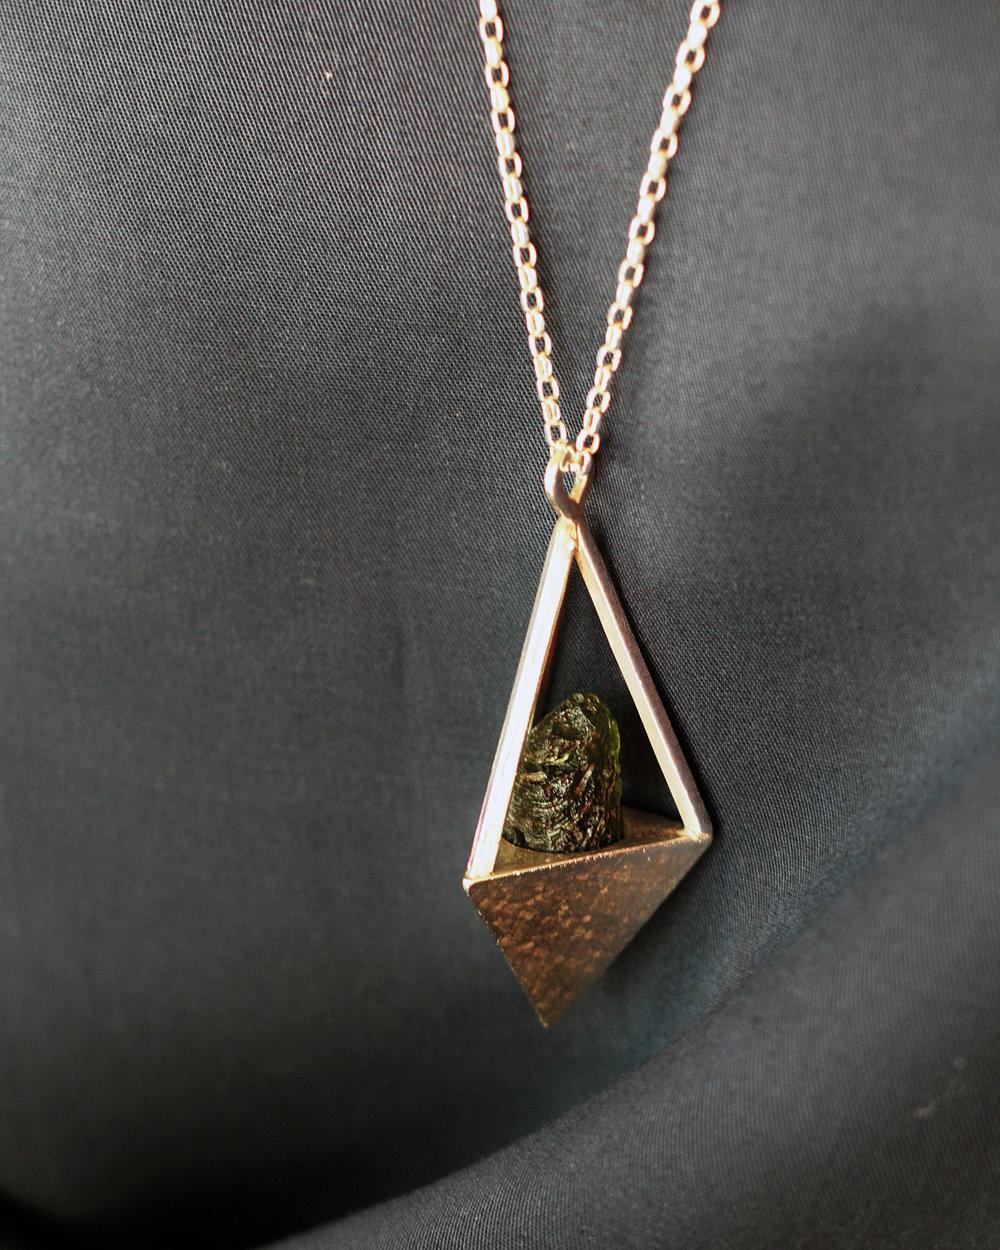 irene-marie-seelig-necklace.jpg